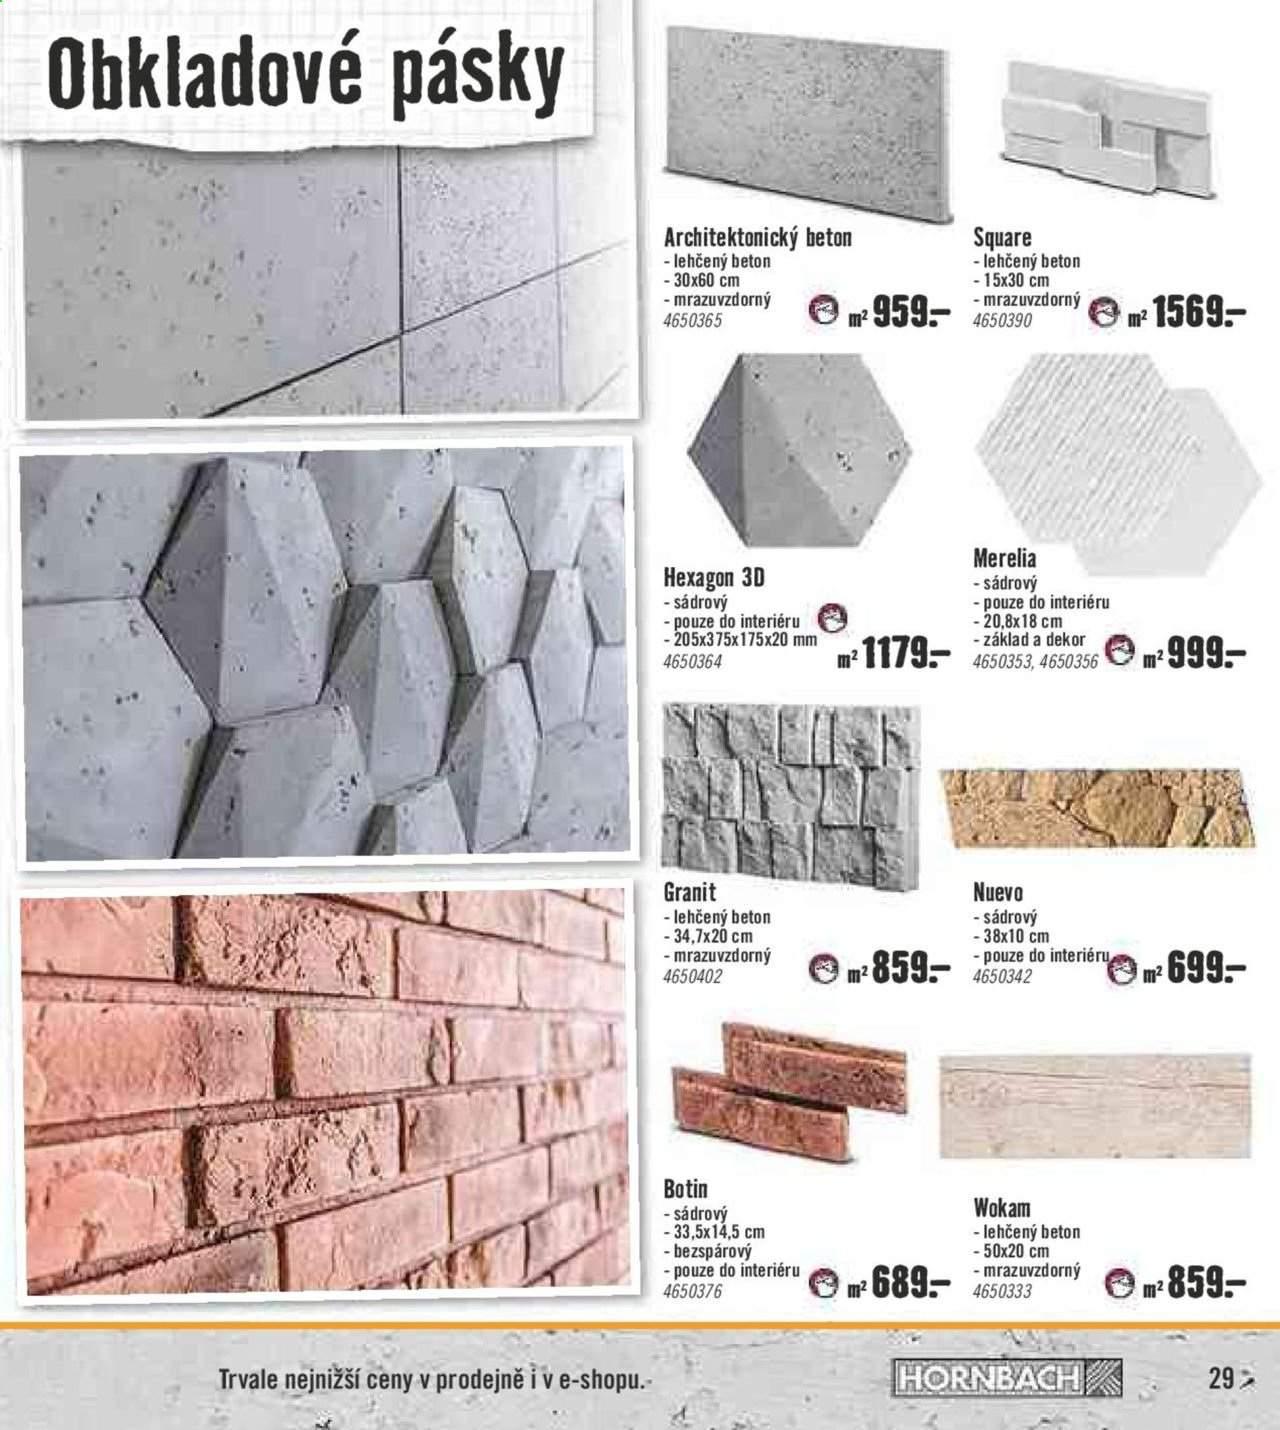 Platten Verlegen Garten Luxus Hornbach Granitplatten 🌱 Natursteinplatten Kaufen Bei New